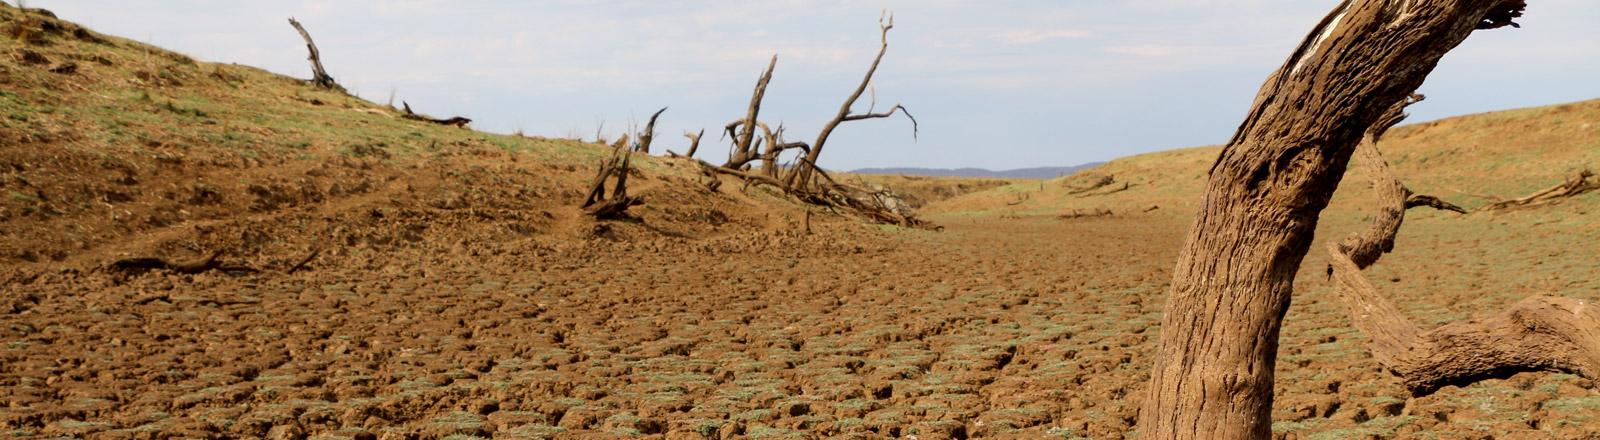 Ein vertrocknetes Feld in Afrika